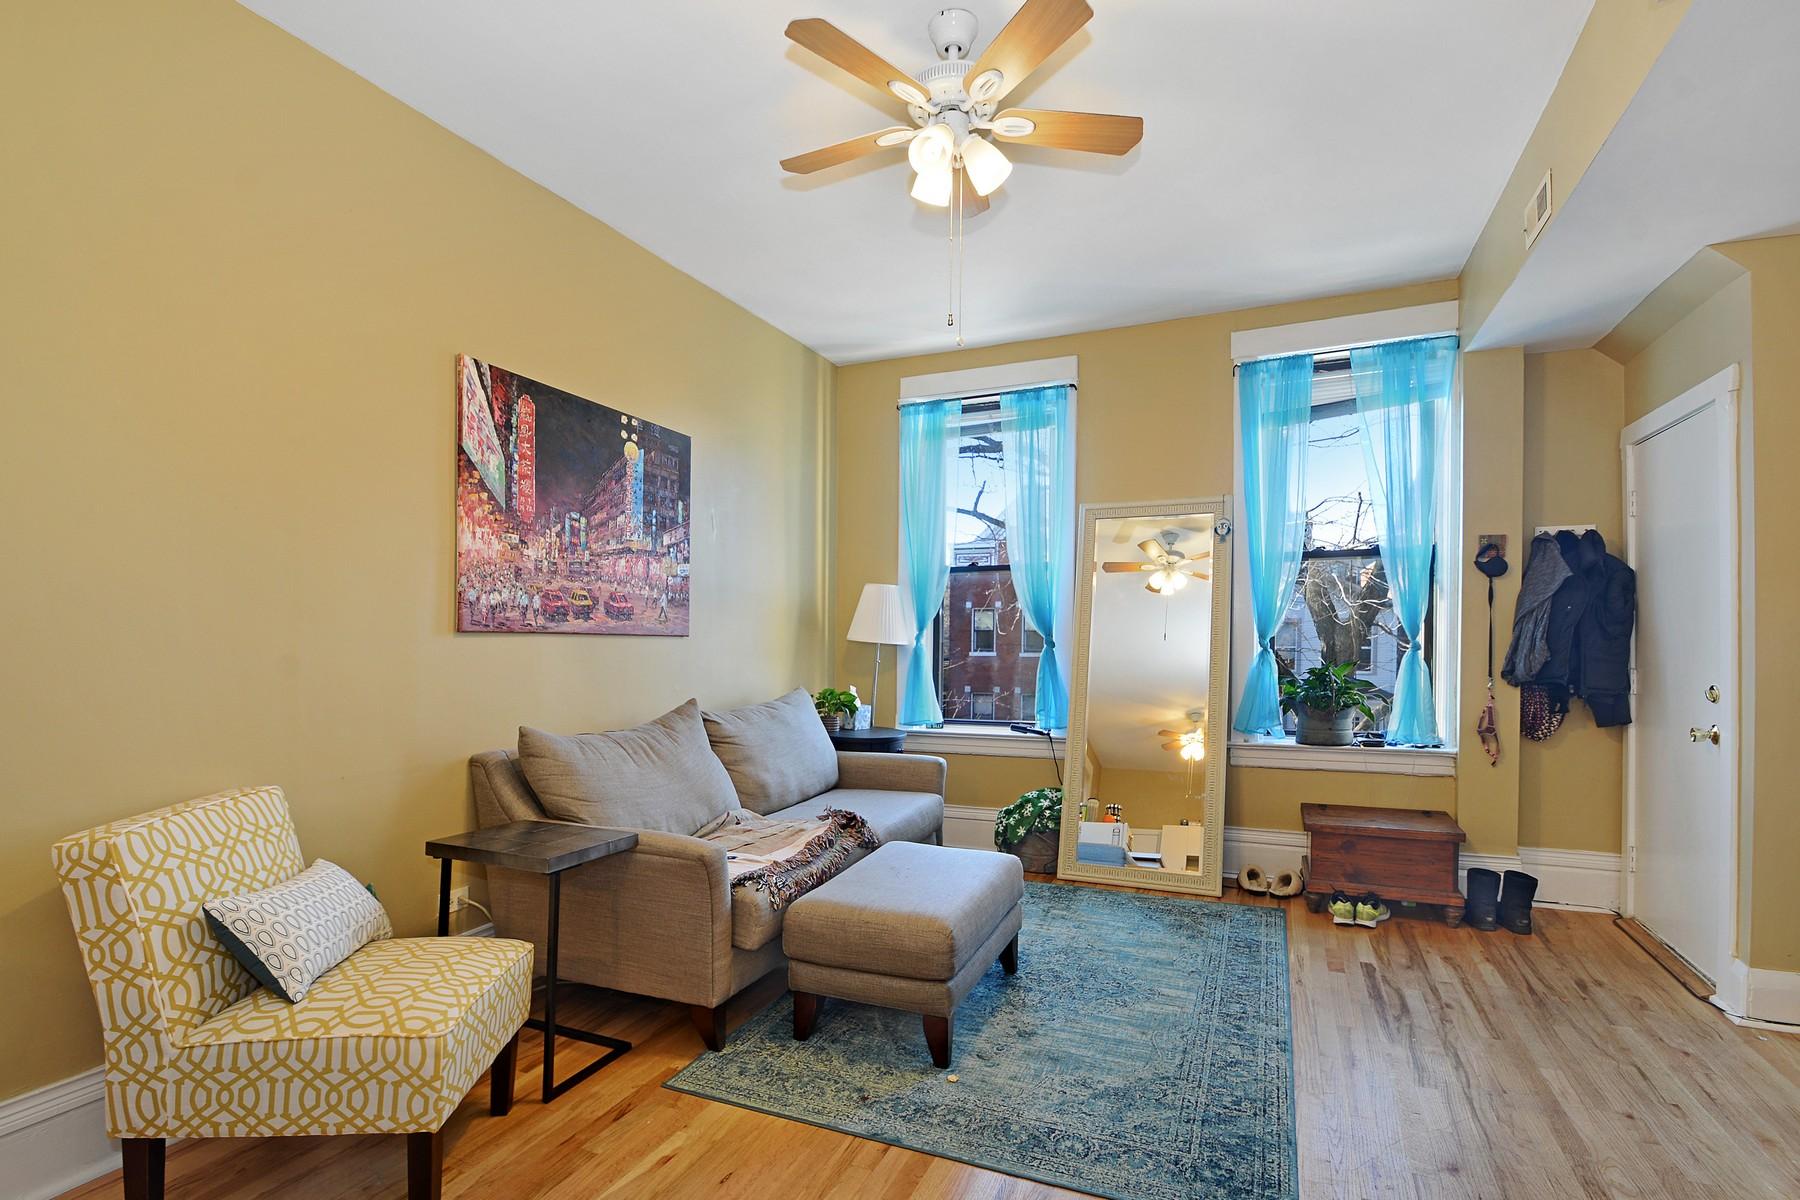 多户住宅 为 销售 在 Beautiful Massive Brick 4 Flat 2117 N Winchester Avenue Logan Square, 芝加哥, 伊利诺斯州, 60614 美国